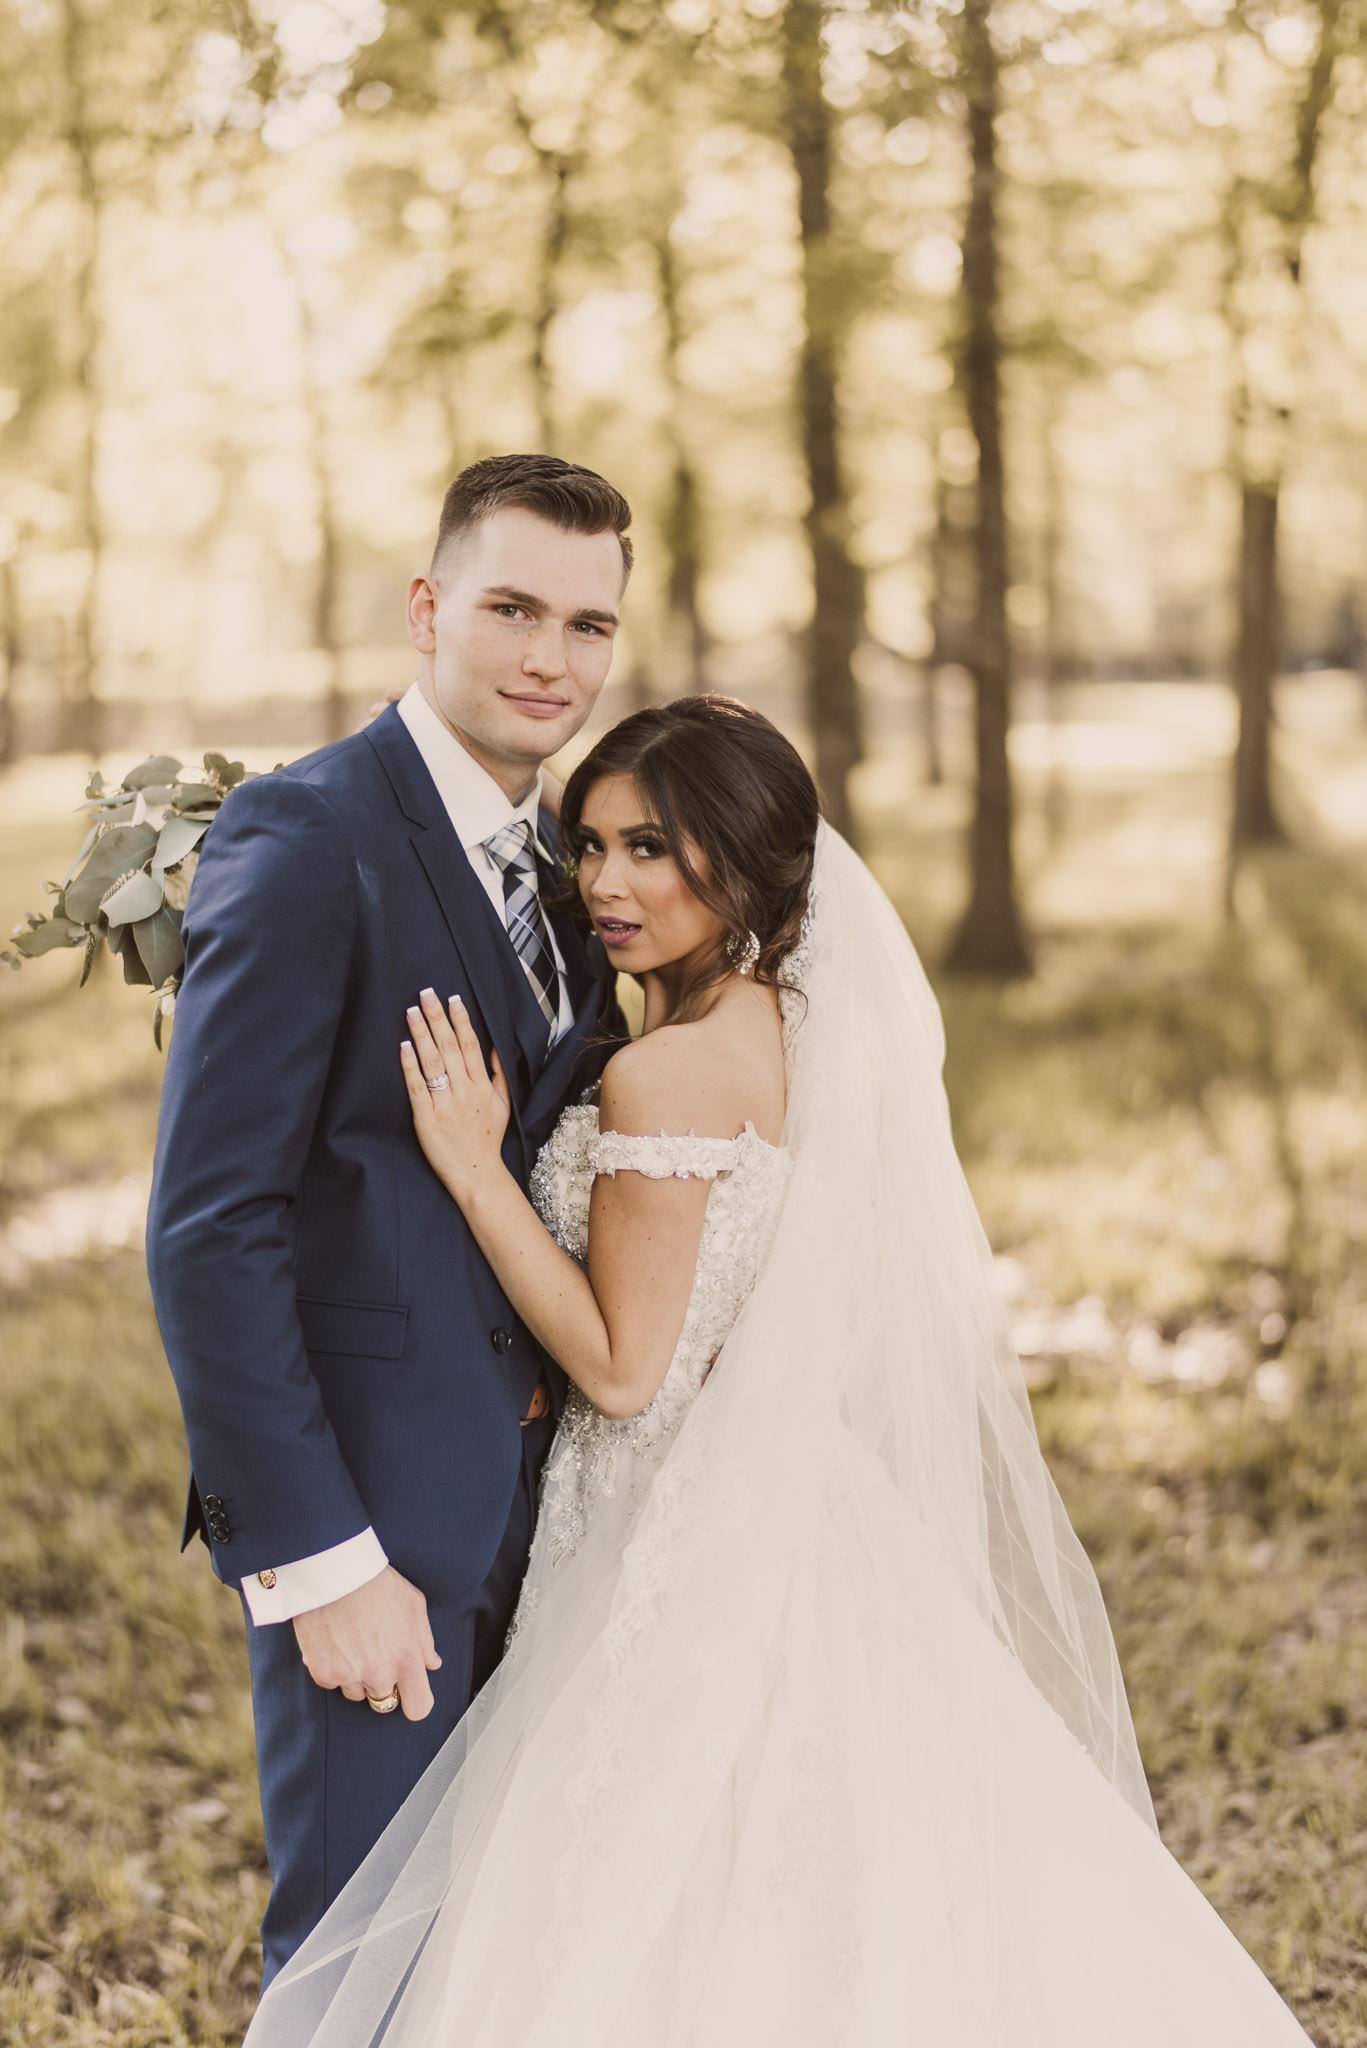 adriana-christian-wedding-re-sm-111.jpg